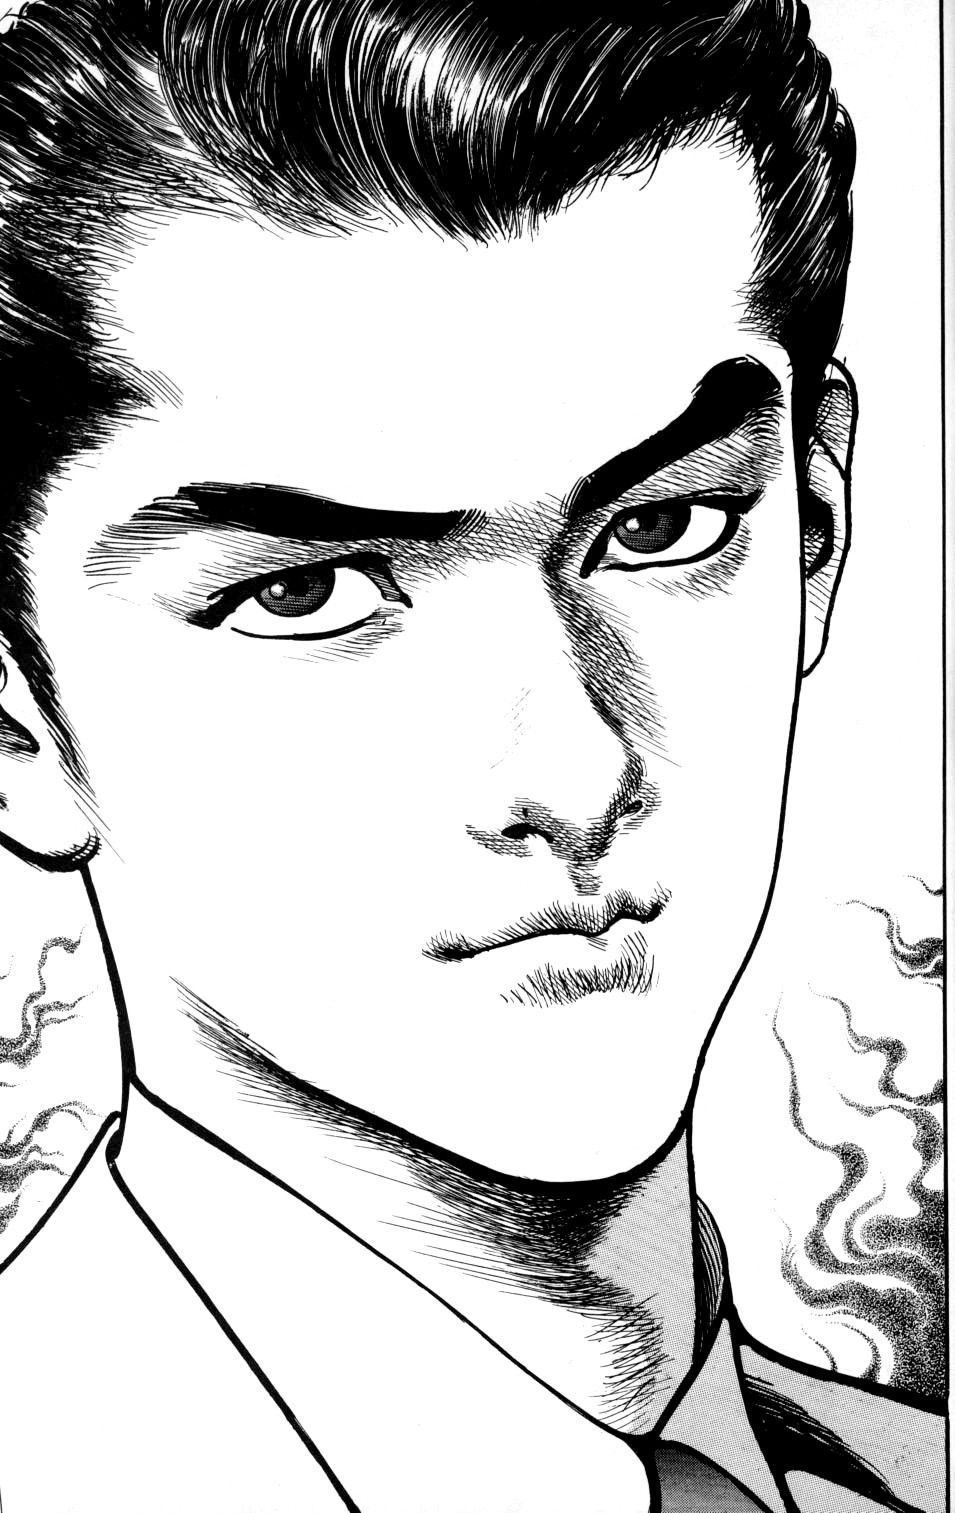 Sanctuary   Manga artist